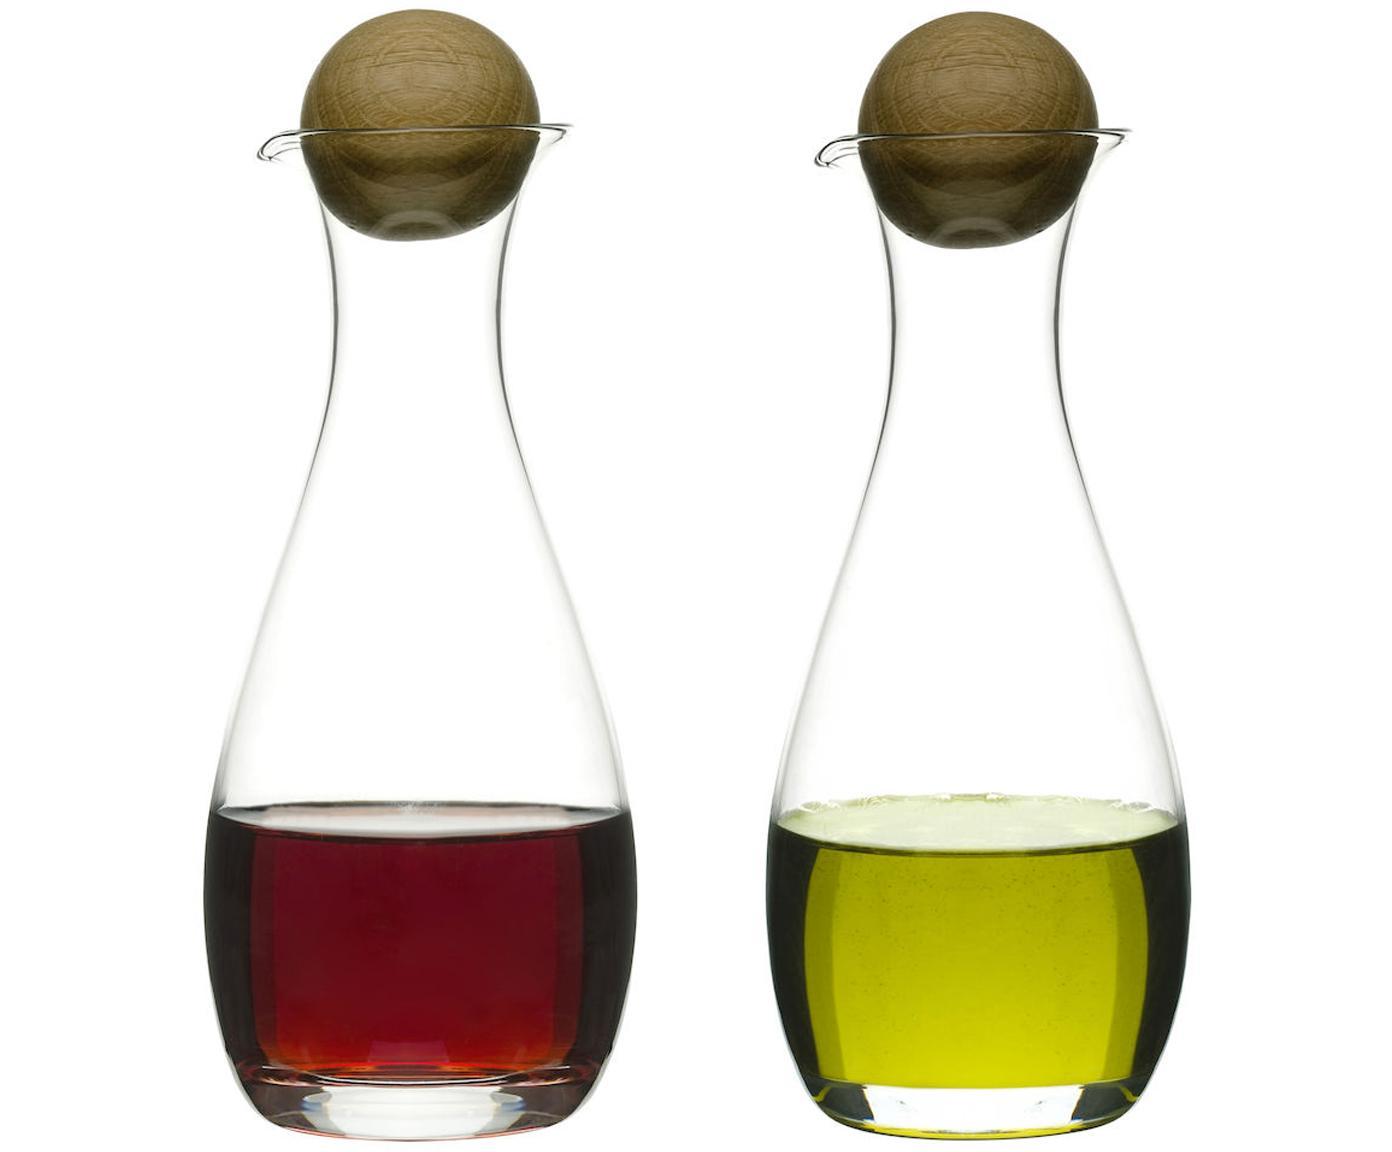 Mondgeblazen azijn- en olie-dispenser Eden, 2-delig, Mondgeblazen glas, eikenhout, Transparent, eikenhoutkleurig, Ø 8 x H 19 cm